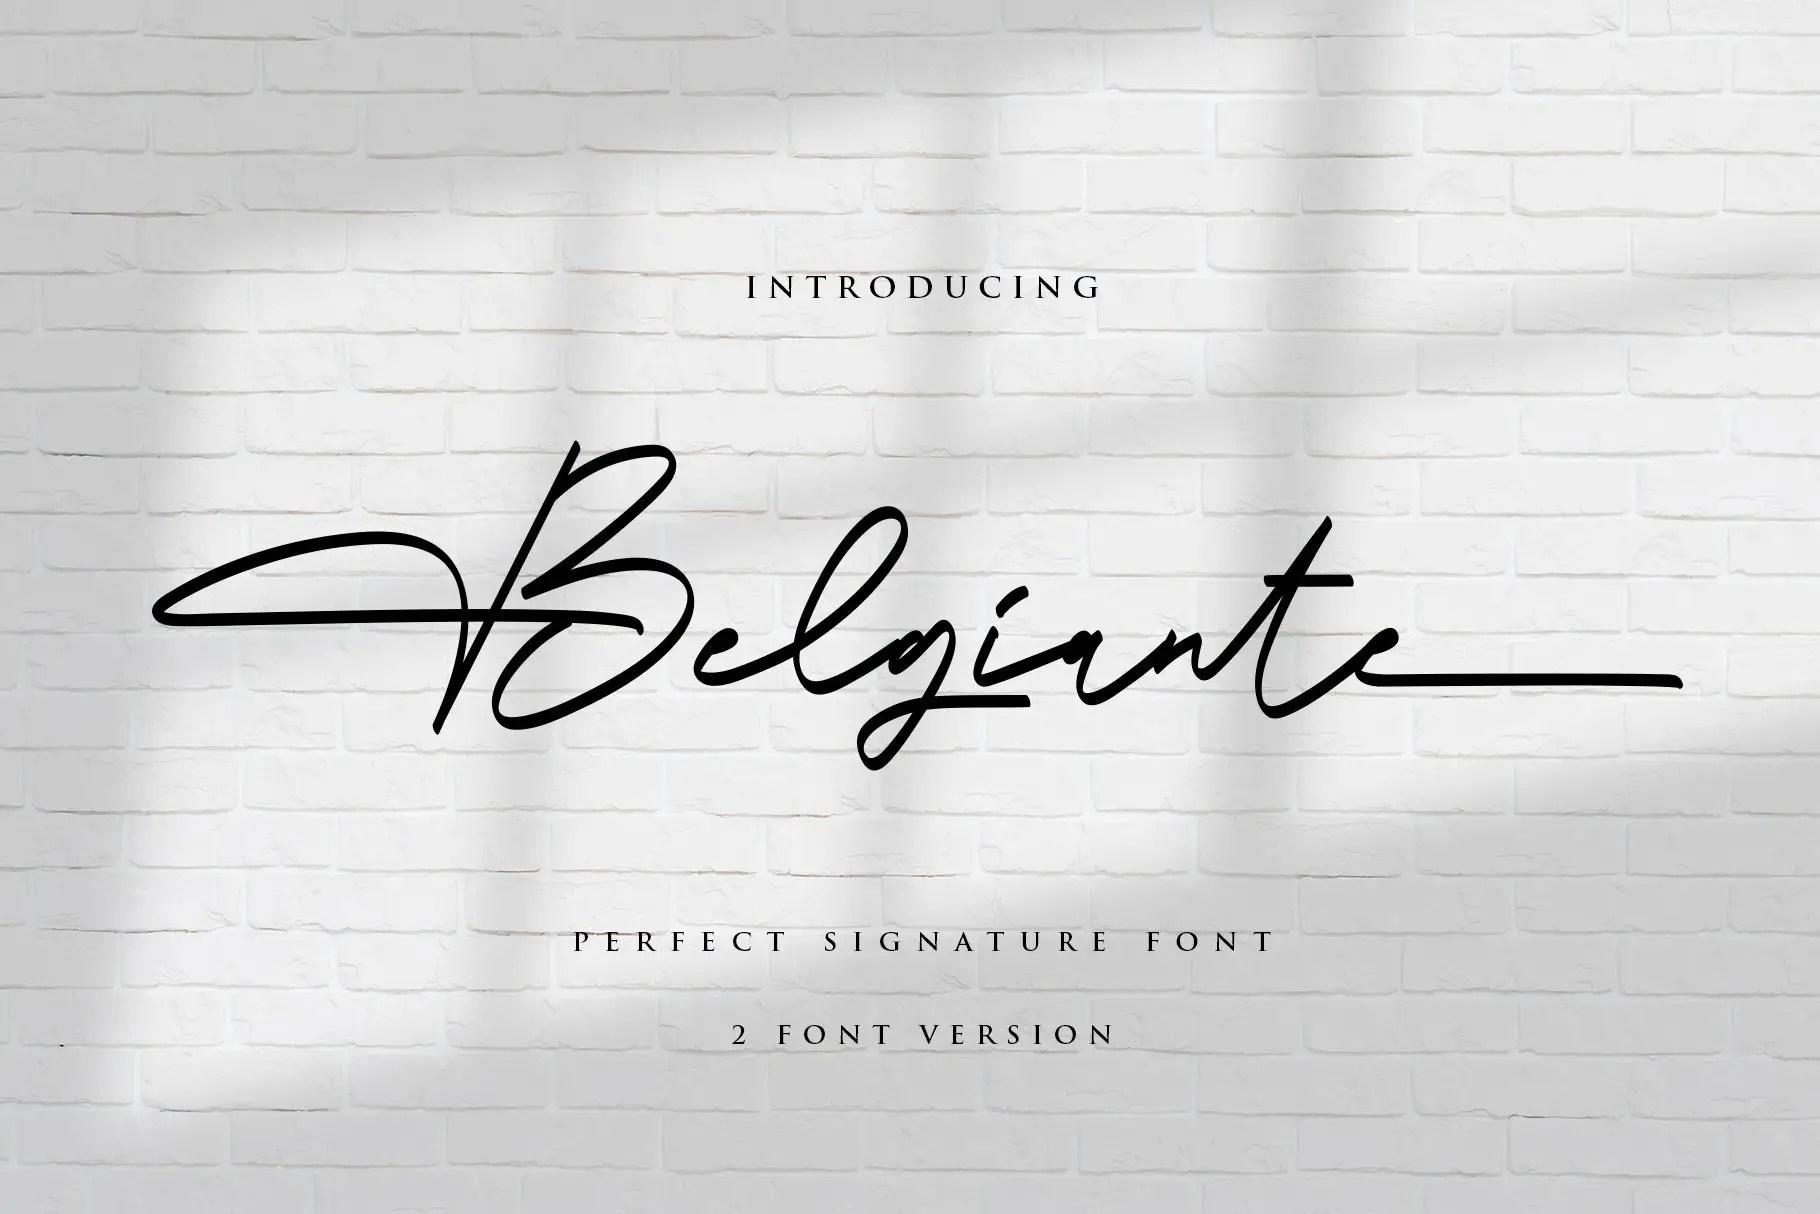 Belgiante-Handwritten-Signature-Font-1